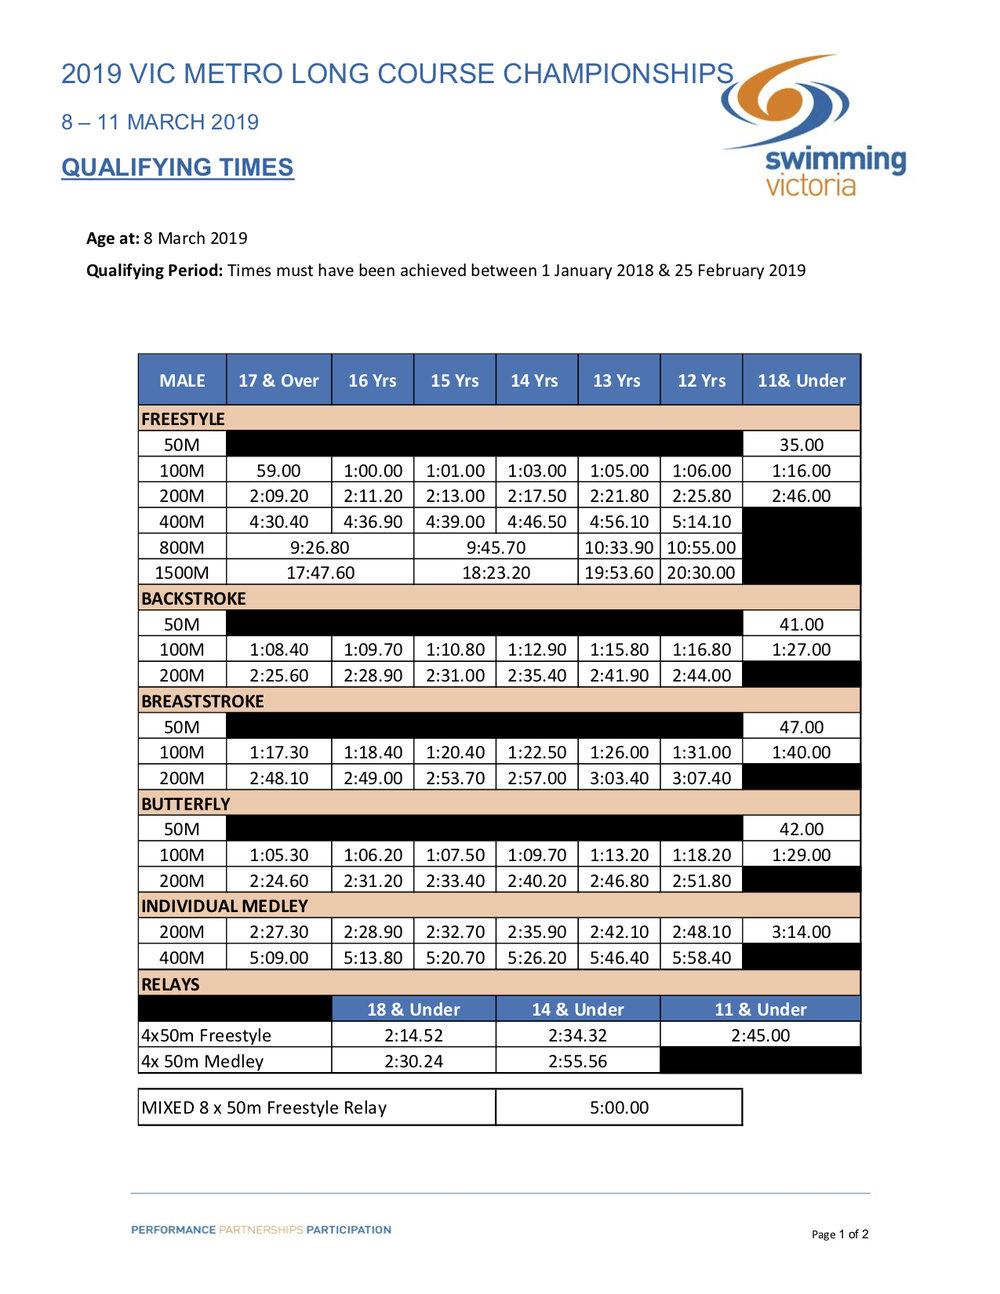 2019 Vic Metro LC Championships Qualifying Times pg1.jpg